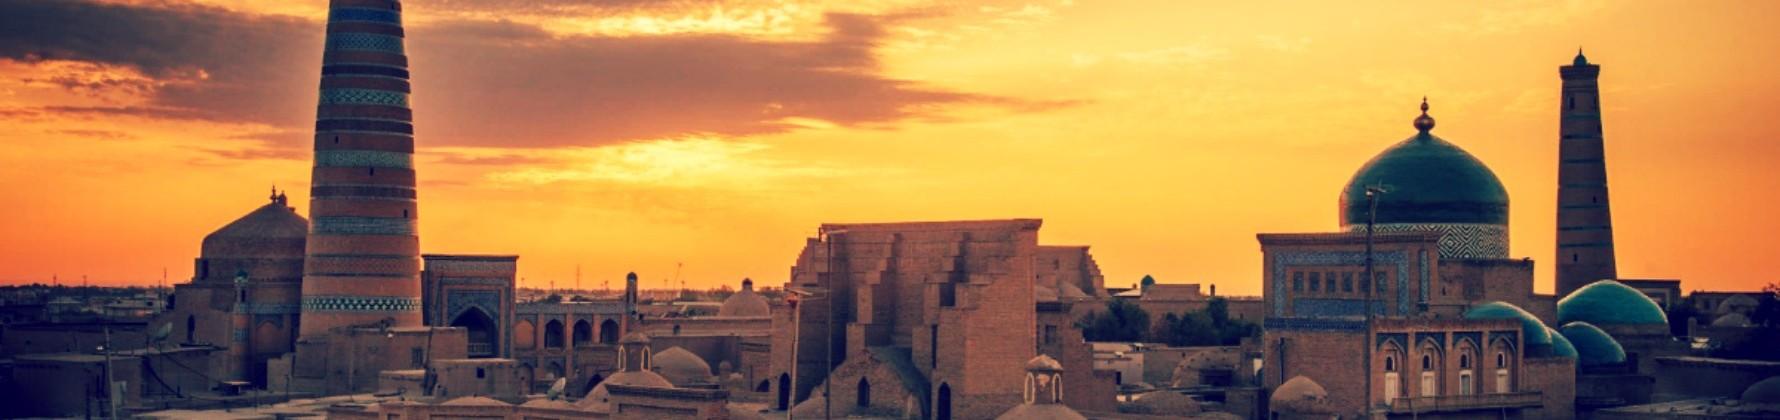 History and Uzbekistan Economy - 1